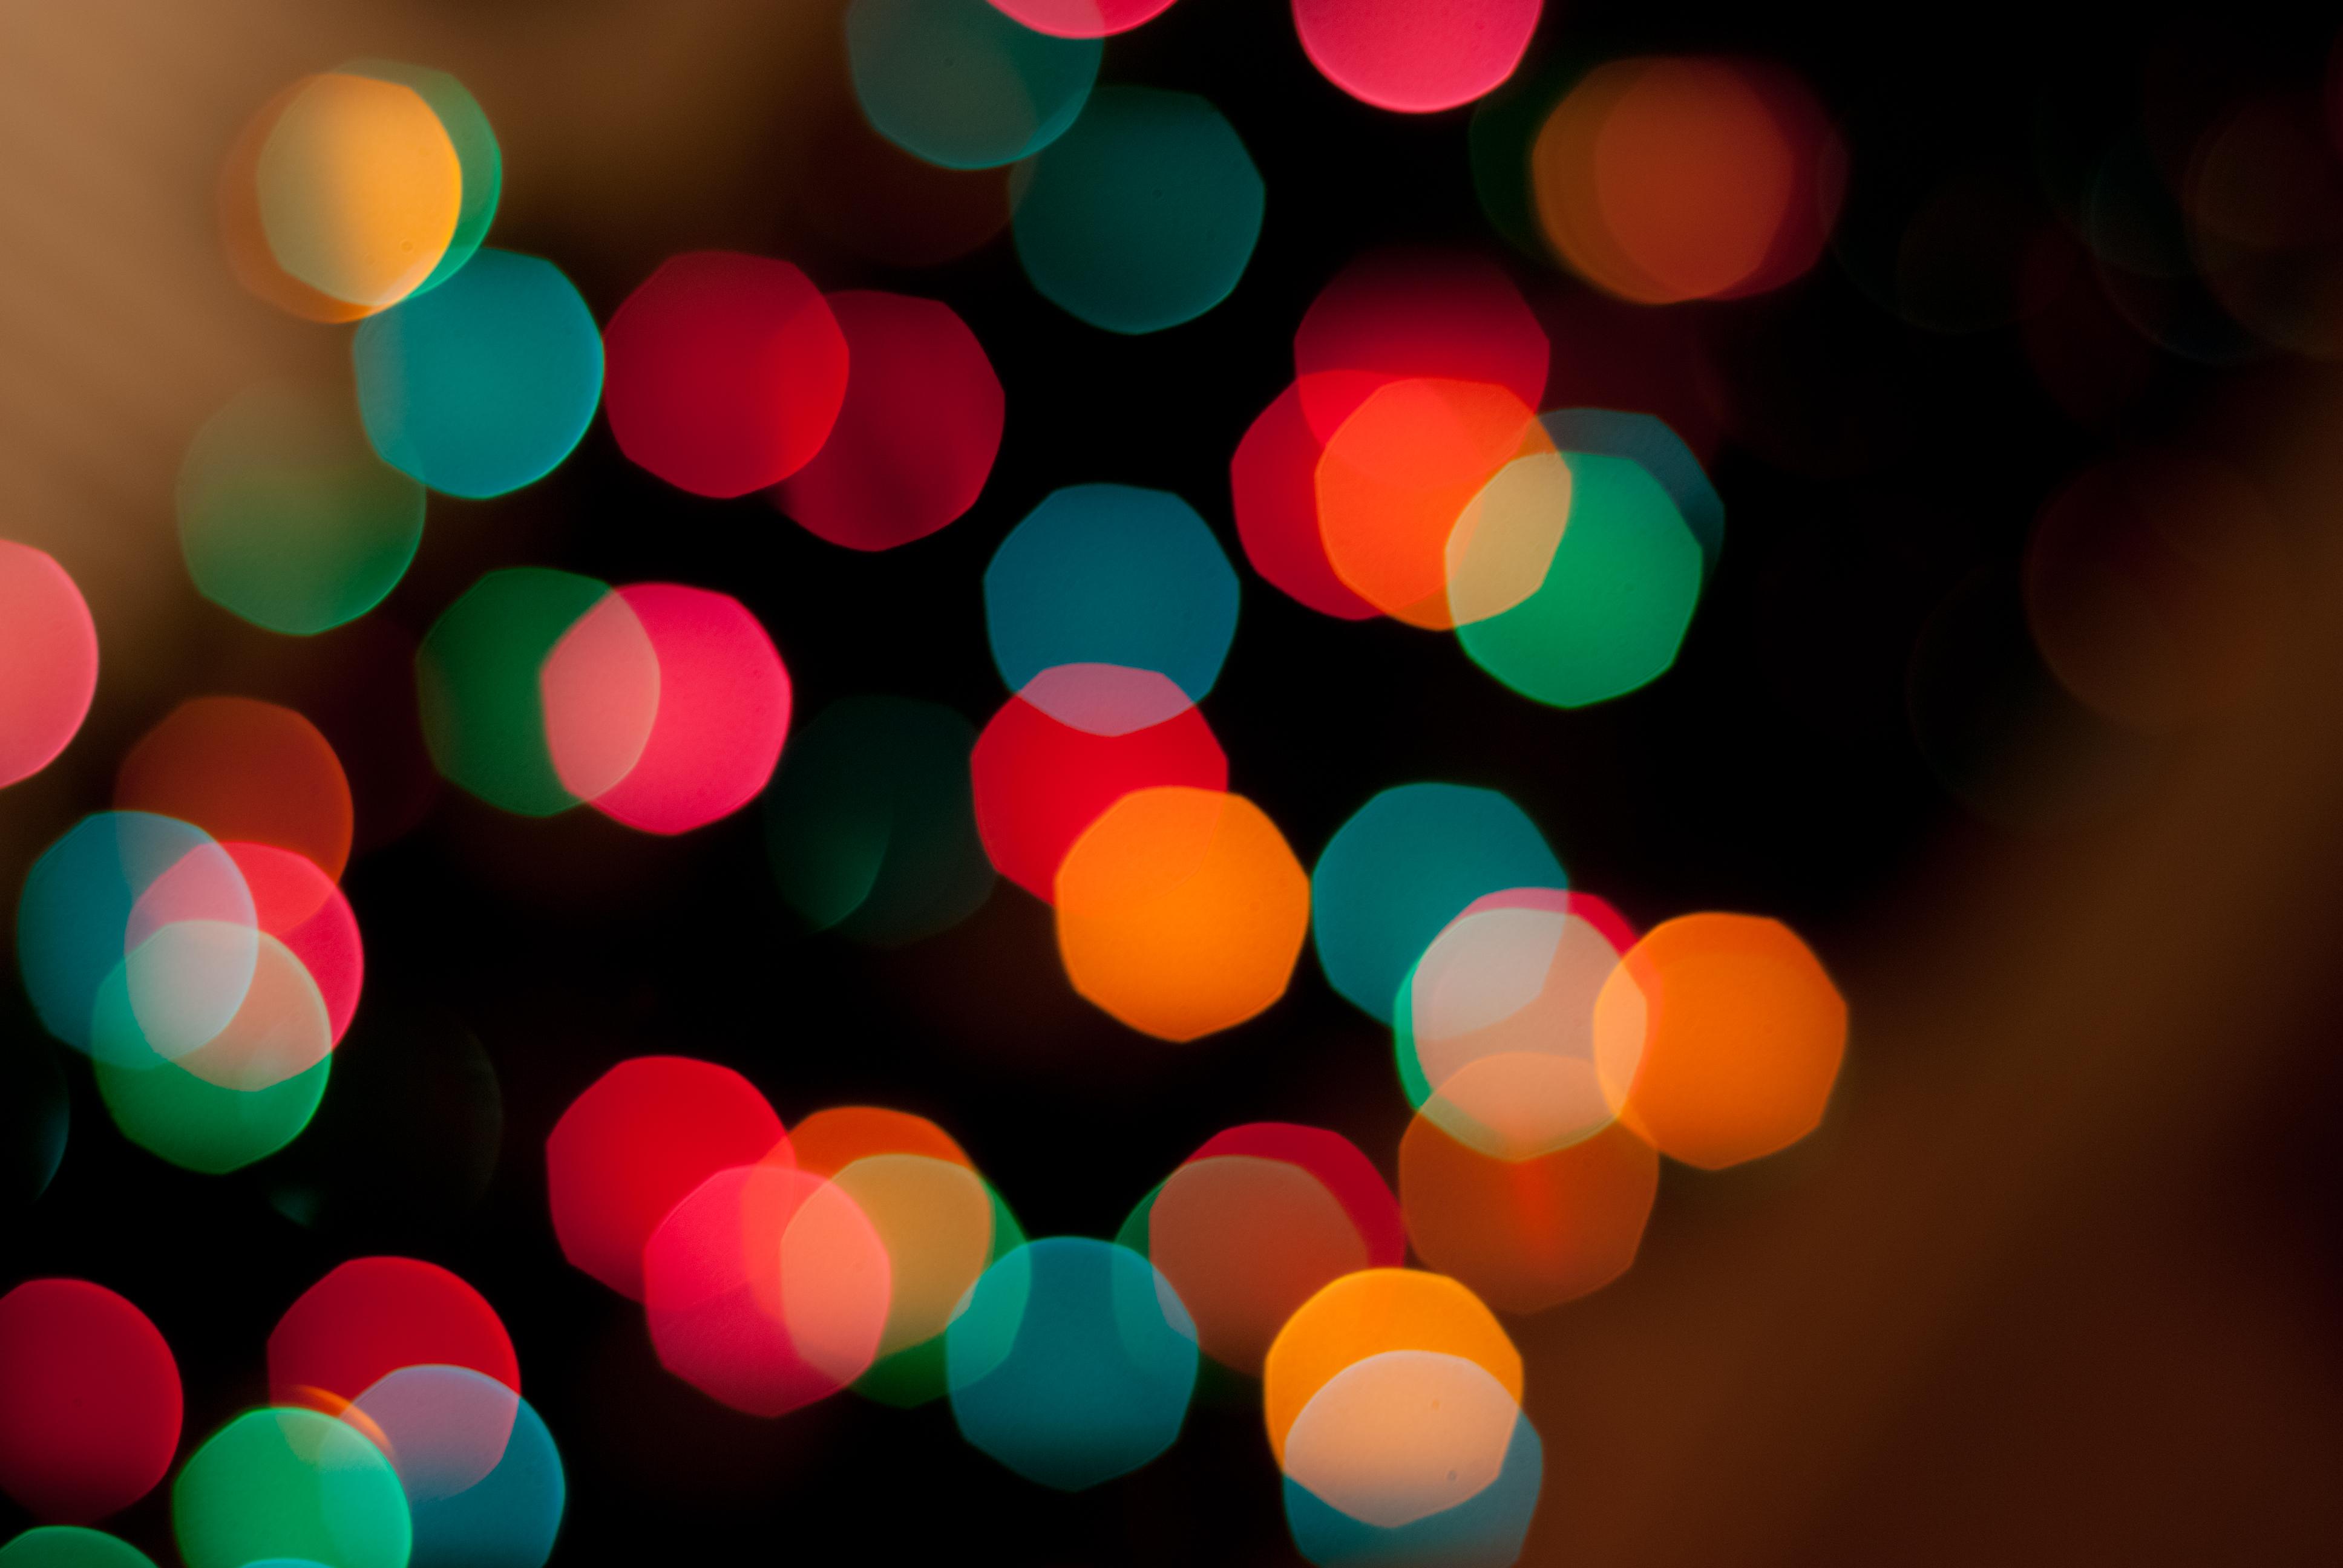 File:Christmas bokeh.jpg - Wikimedia Commons